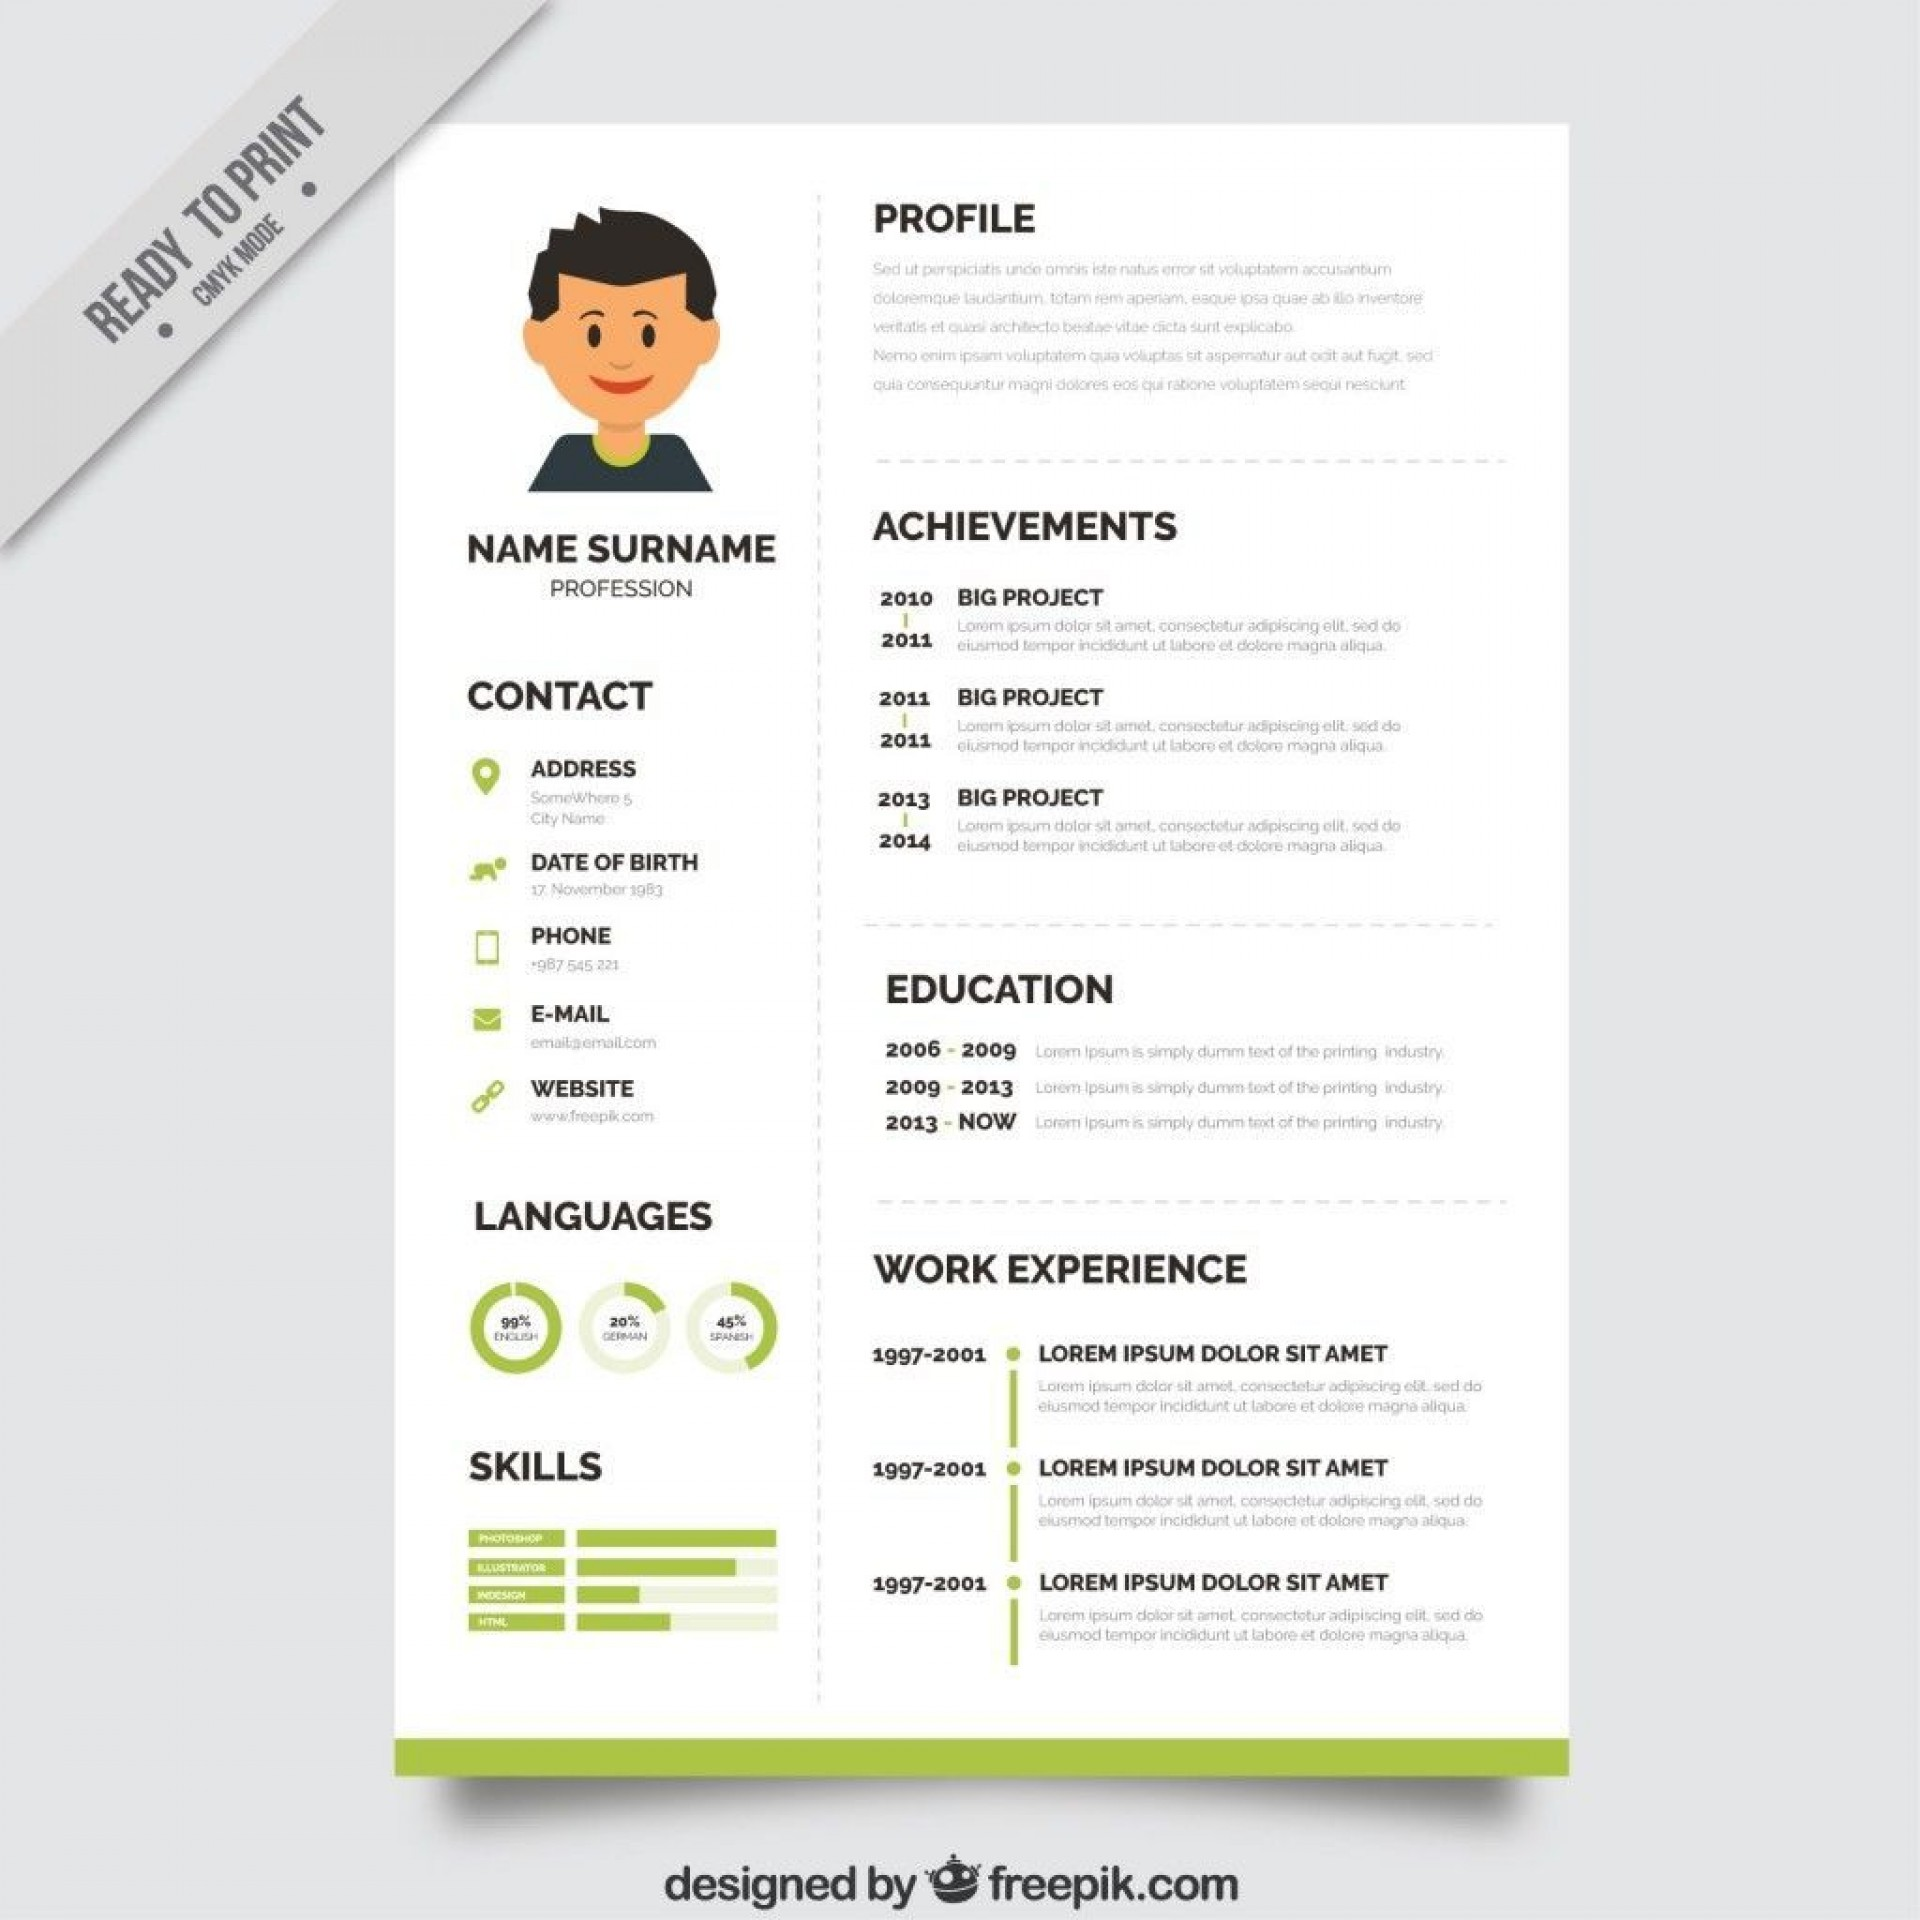 000 Magnificent Psd Resume Template Free Download Concept  Graphic Designer Creative Cv1920